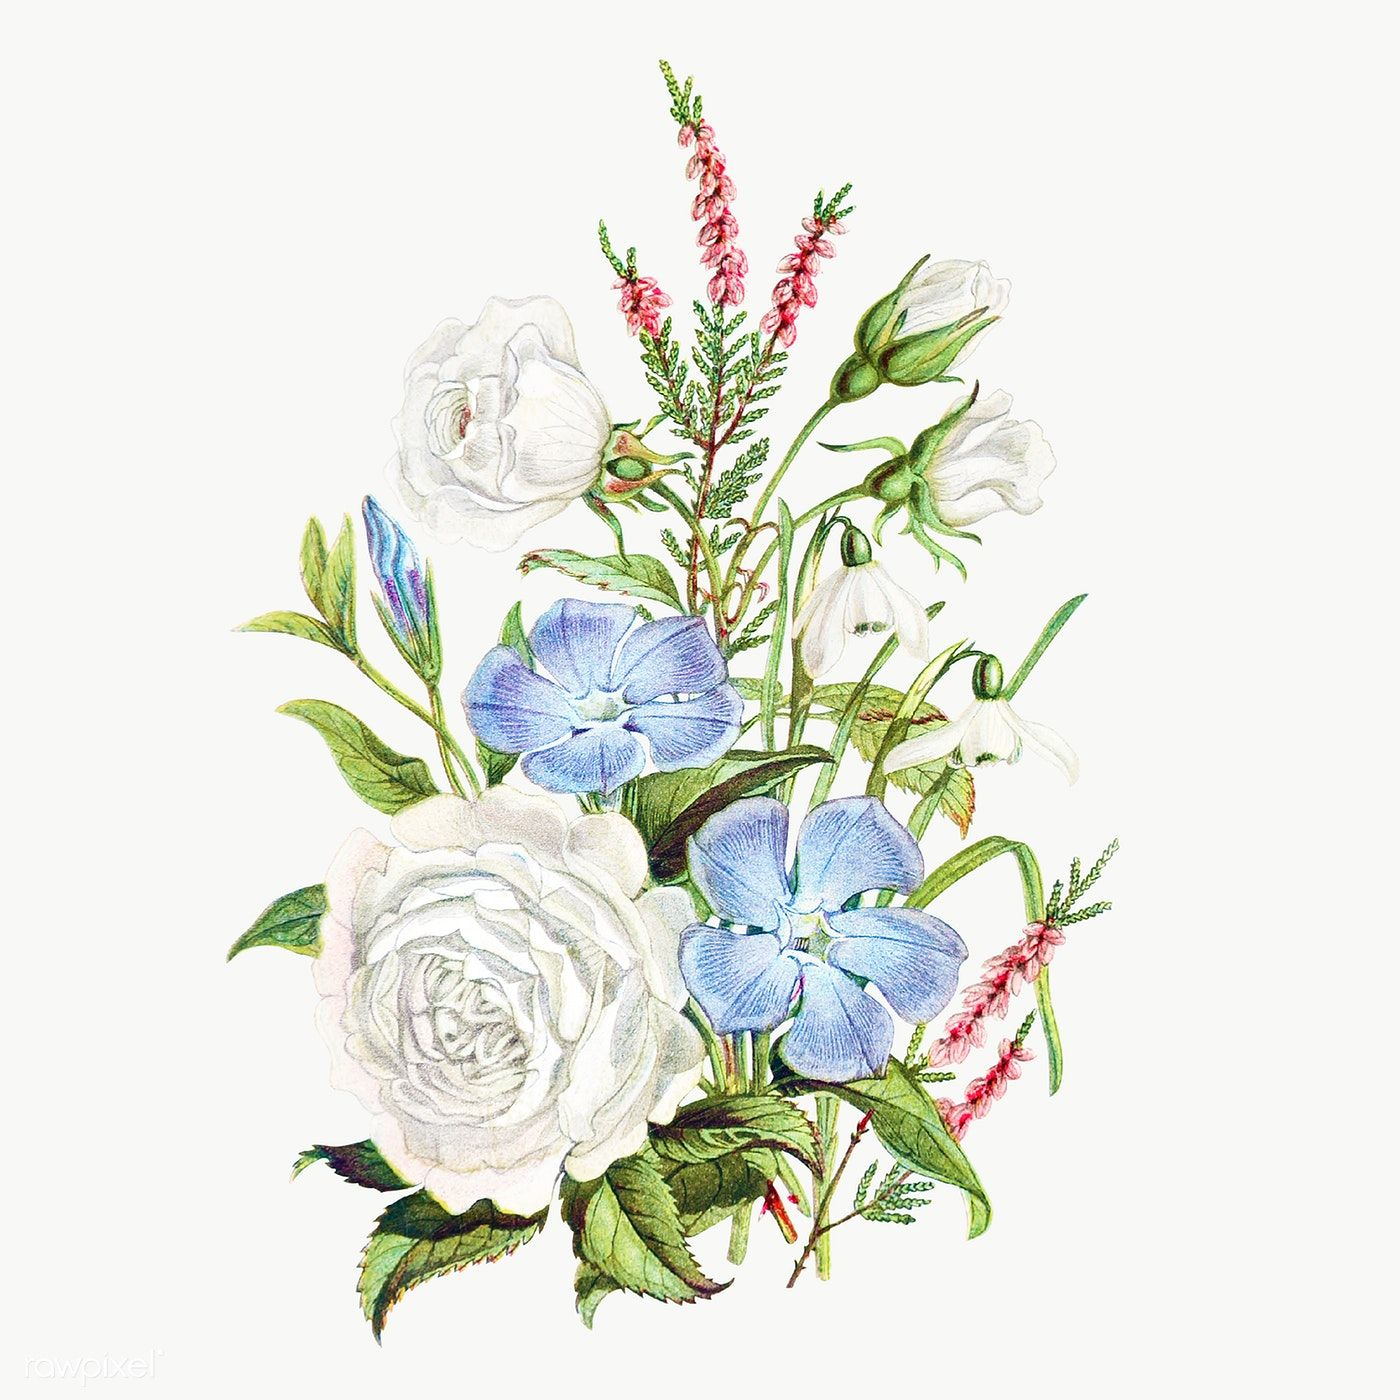 Download Premium Png Of Vintage Flower Bouquet Transparent Png 2098582 In 2020 Summer Flower Bouquet Flower Illustration Vintage Flowers